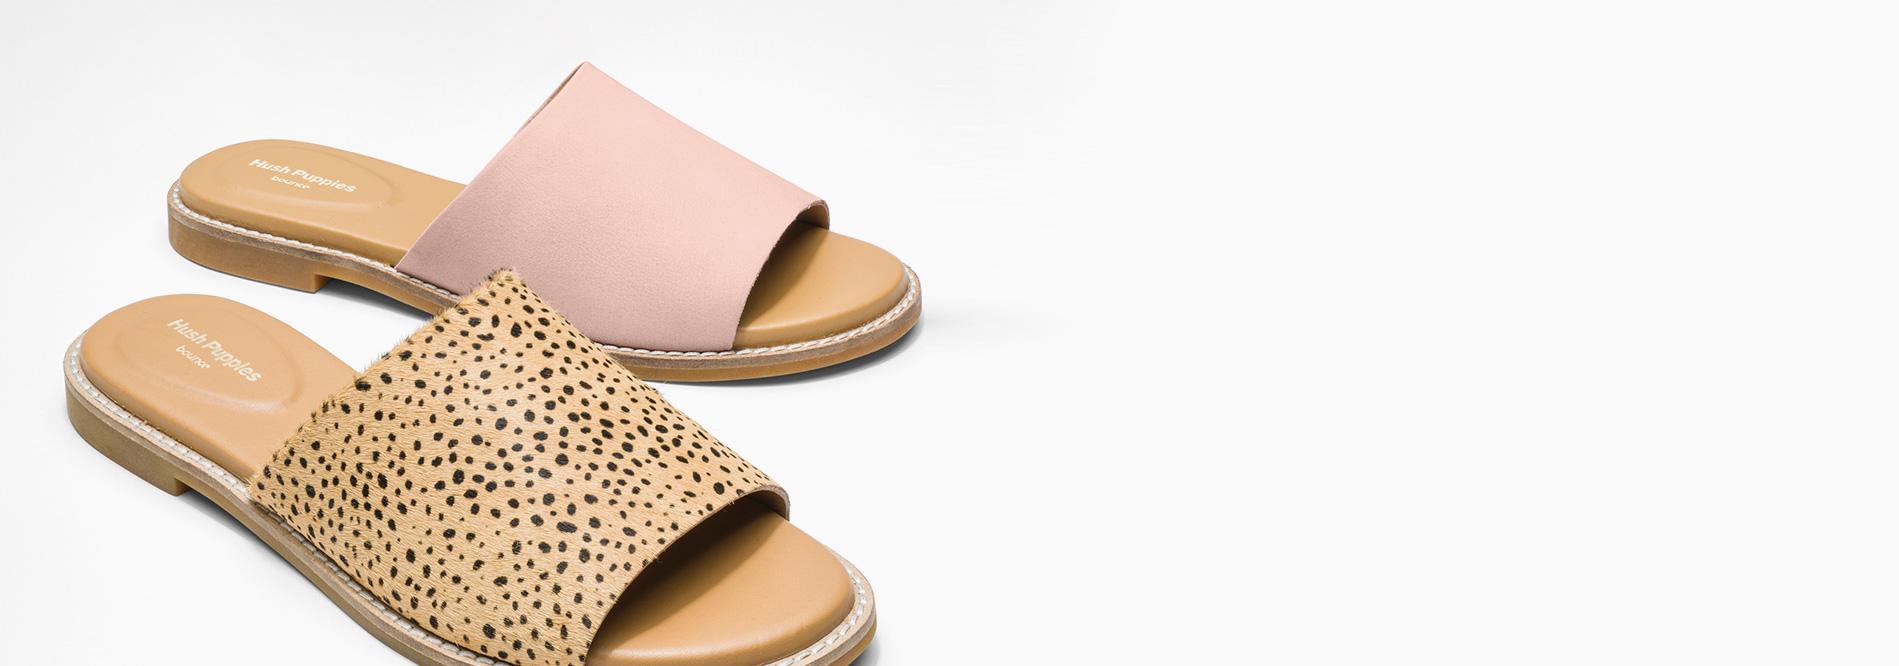 Lexi Slide sandals.